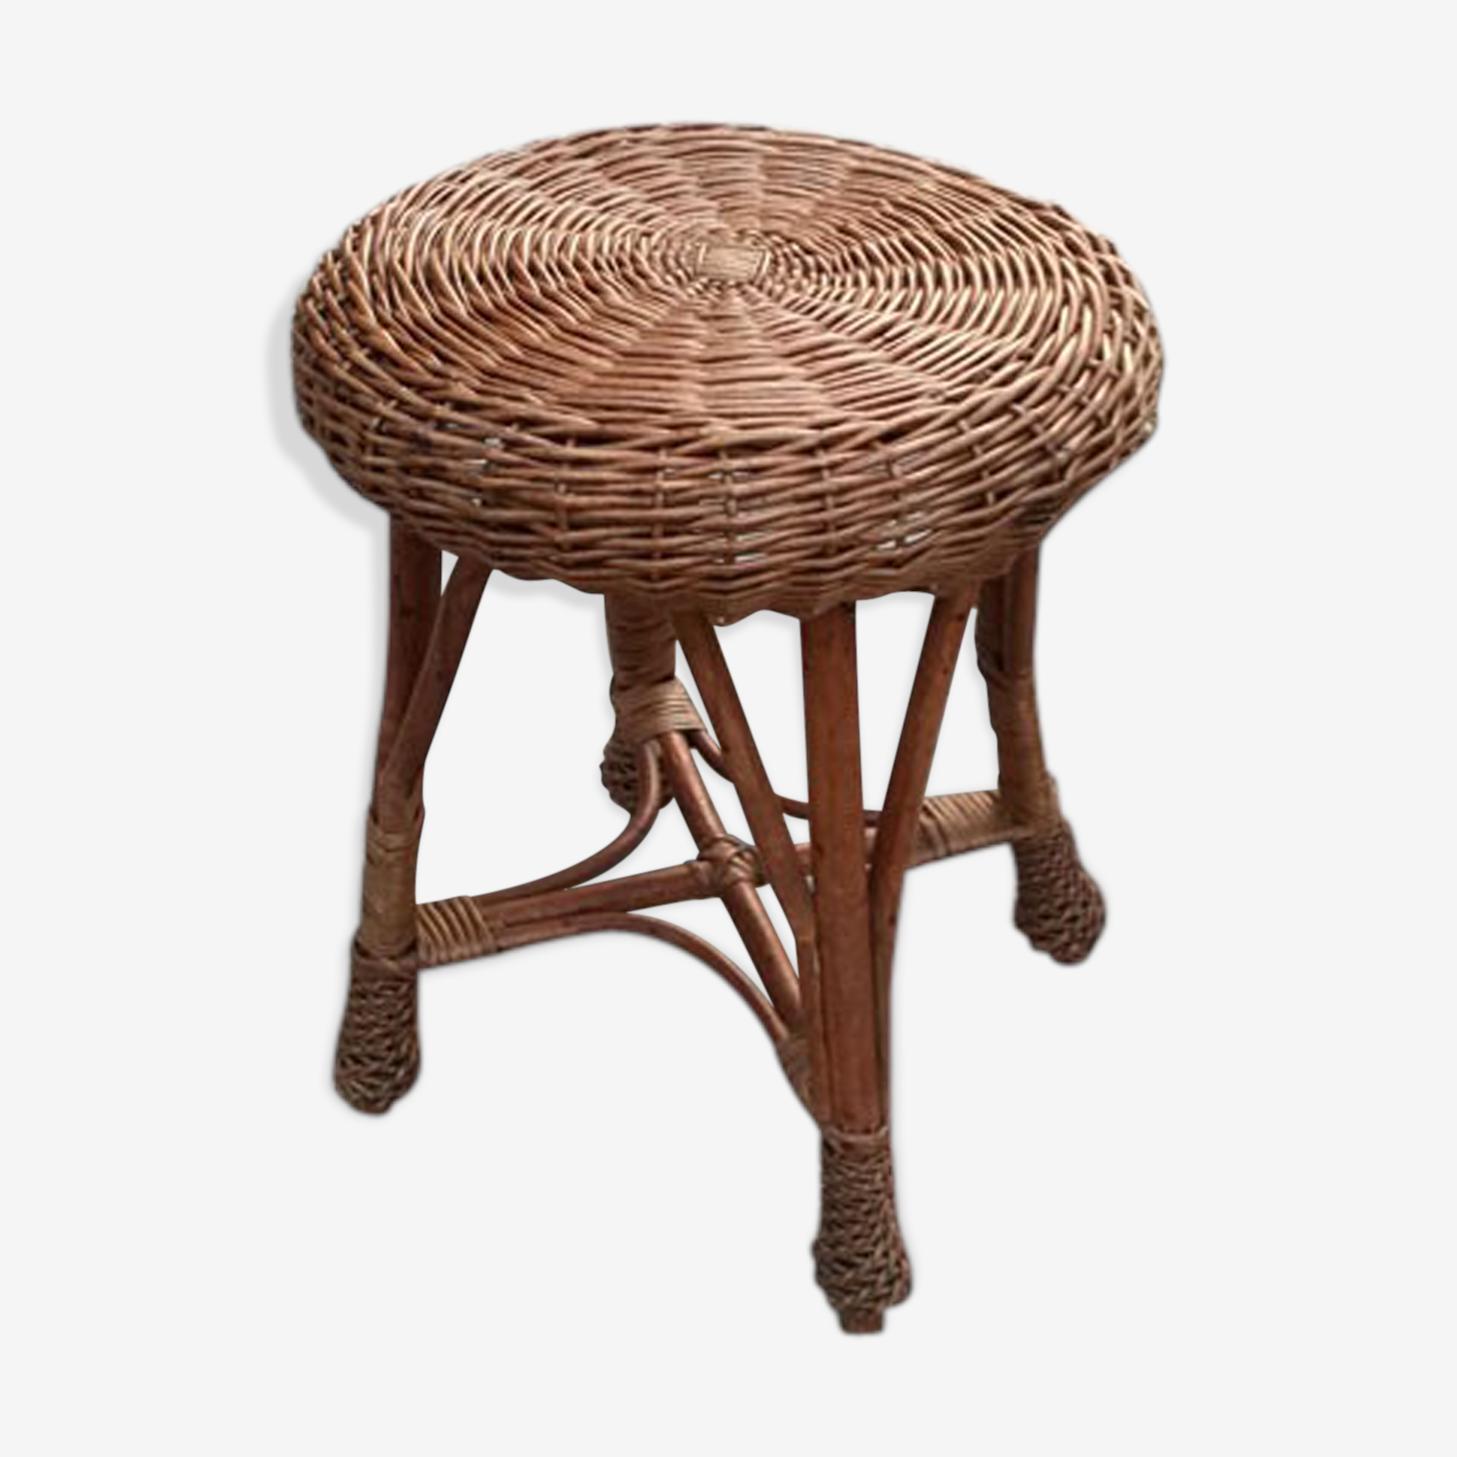 Braided Wicker stool